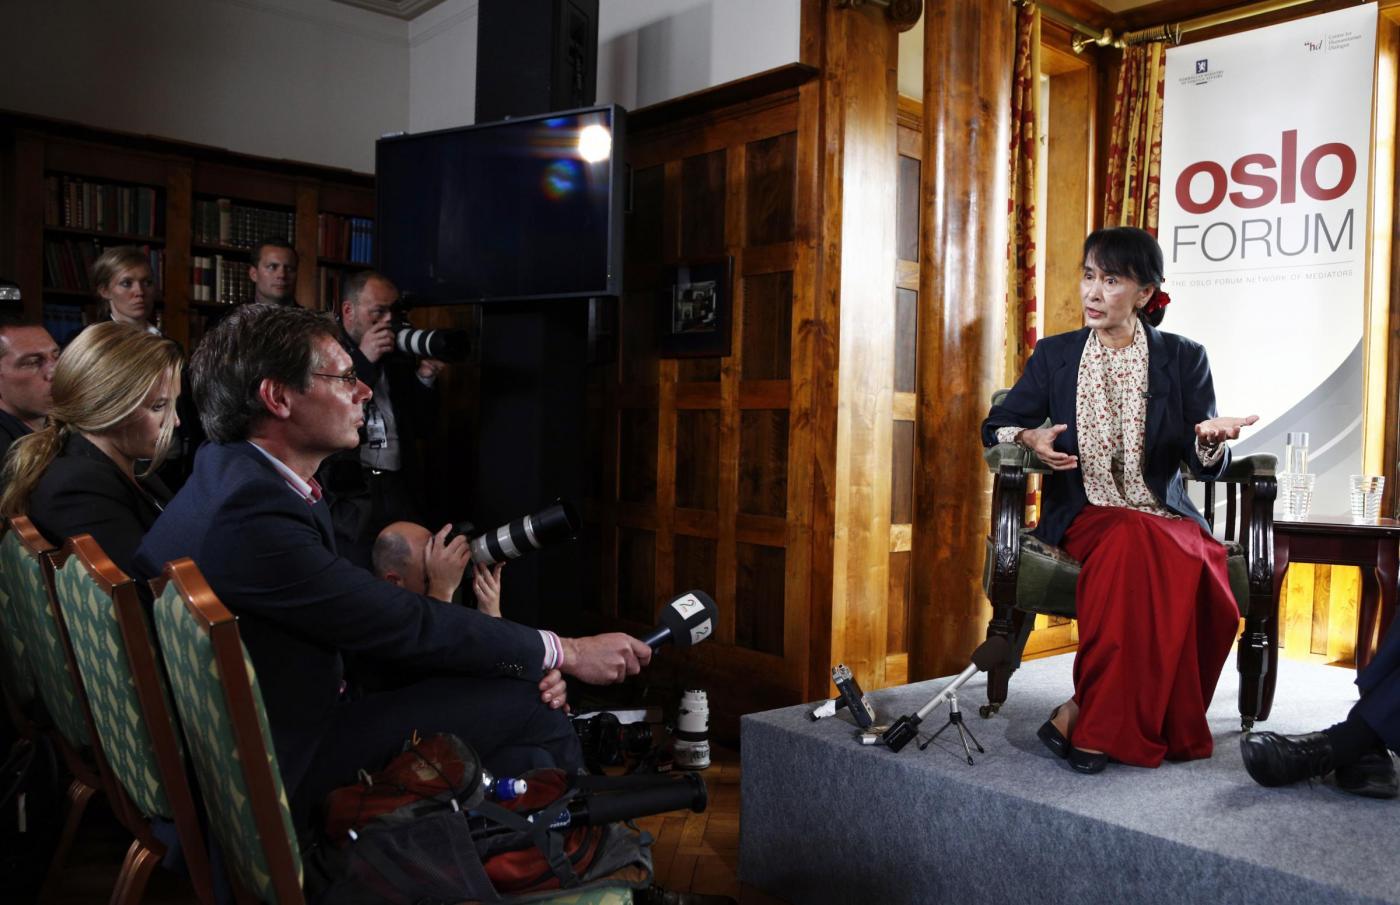 Oslo, Aung san Suu Kyi incontra la star degli U2 Bono09